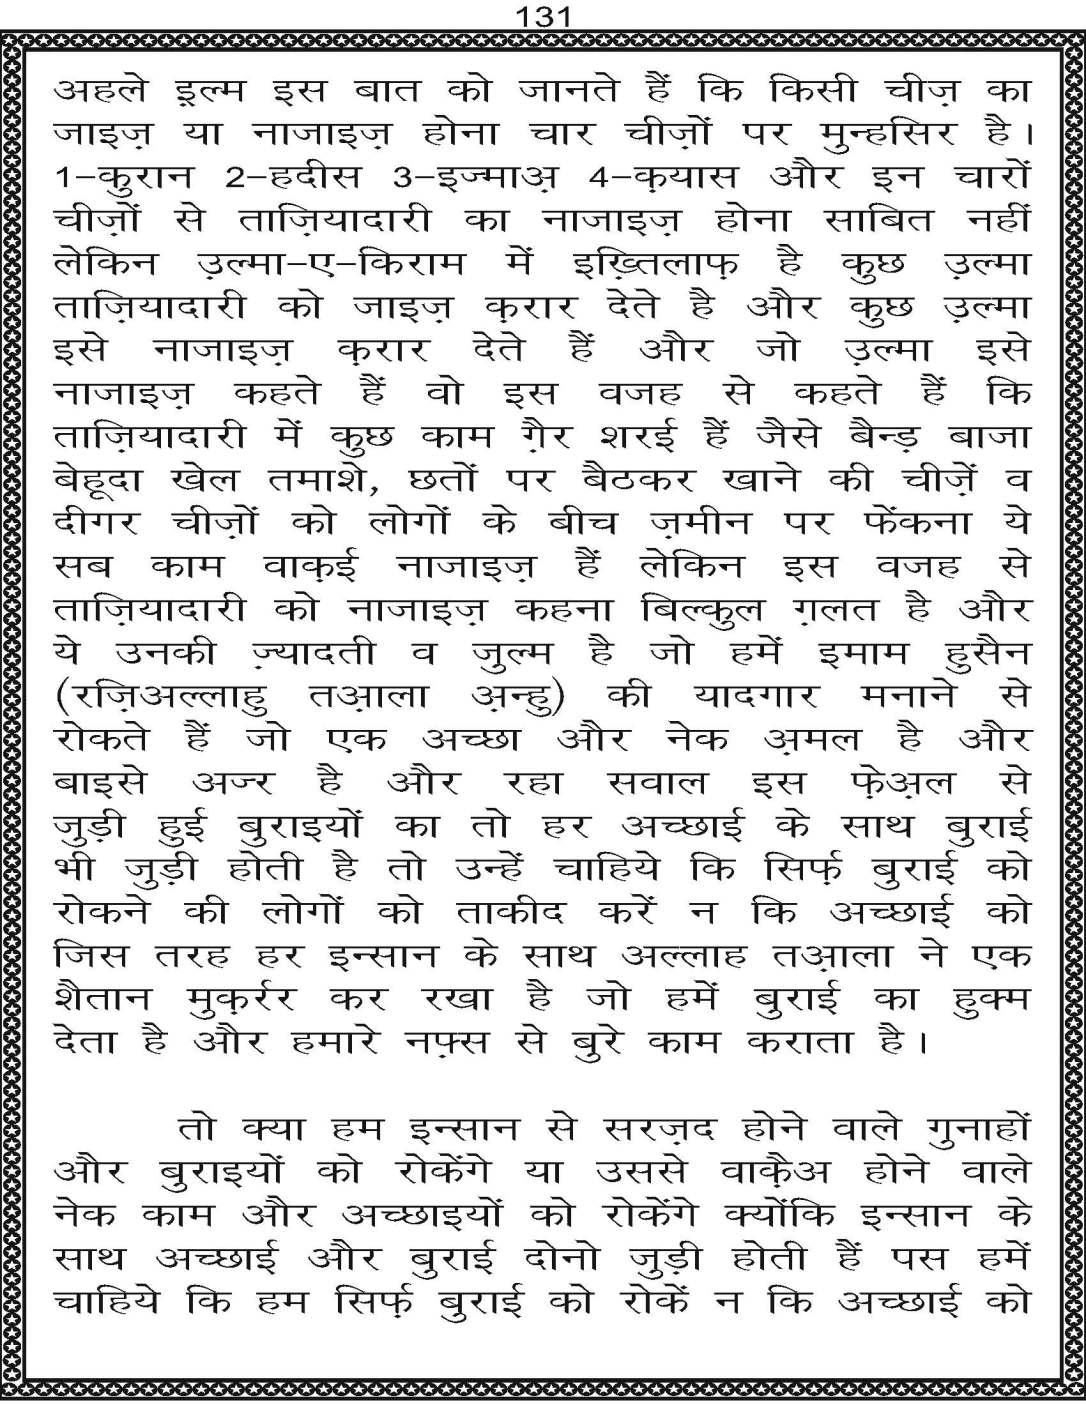 AzmateTaziyadari_Page_131